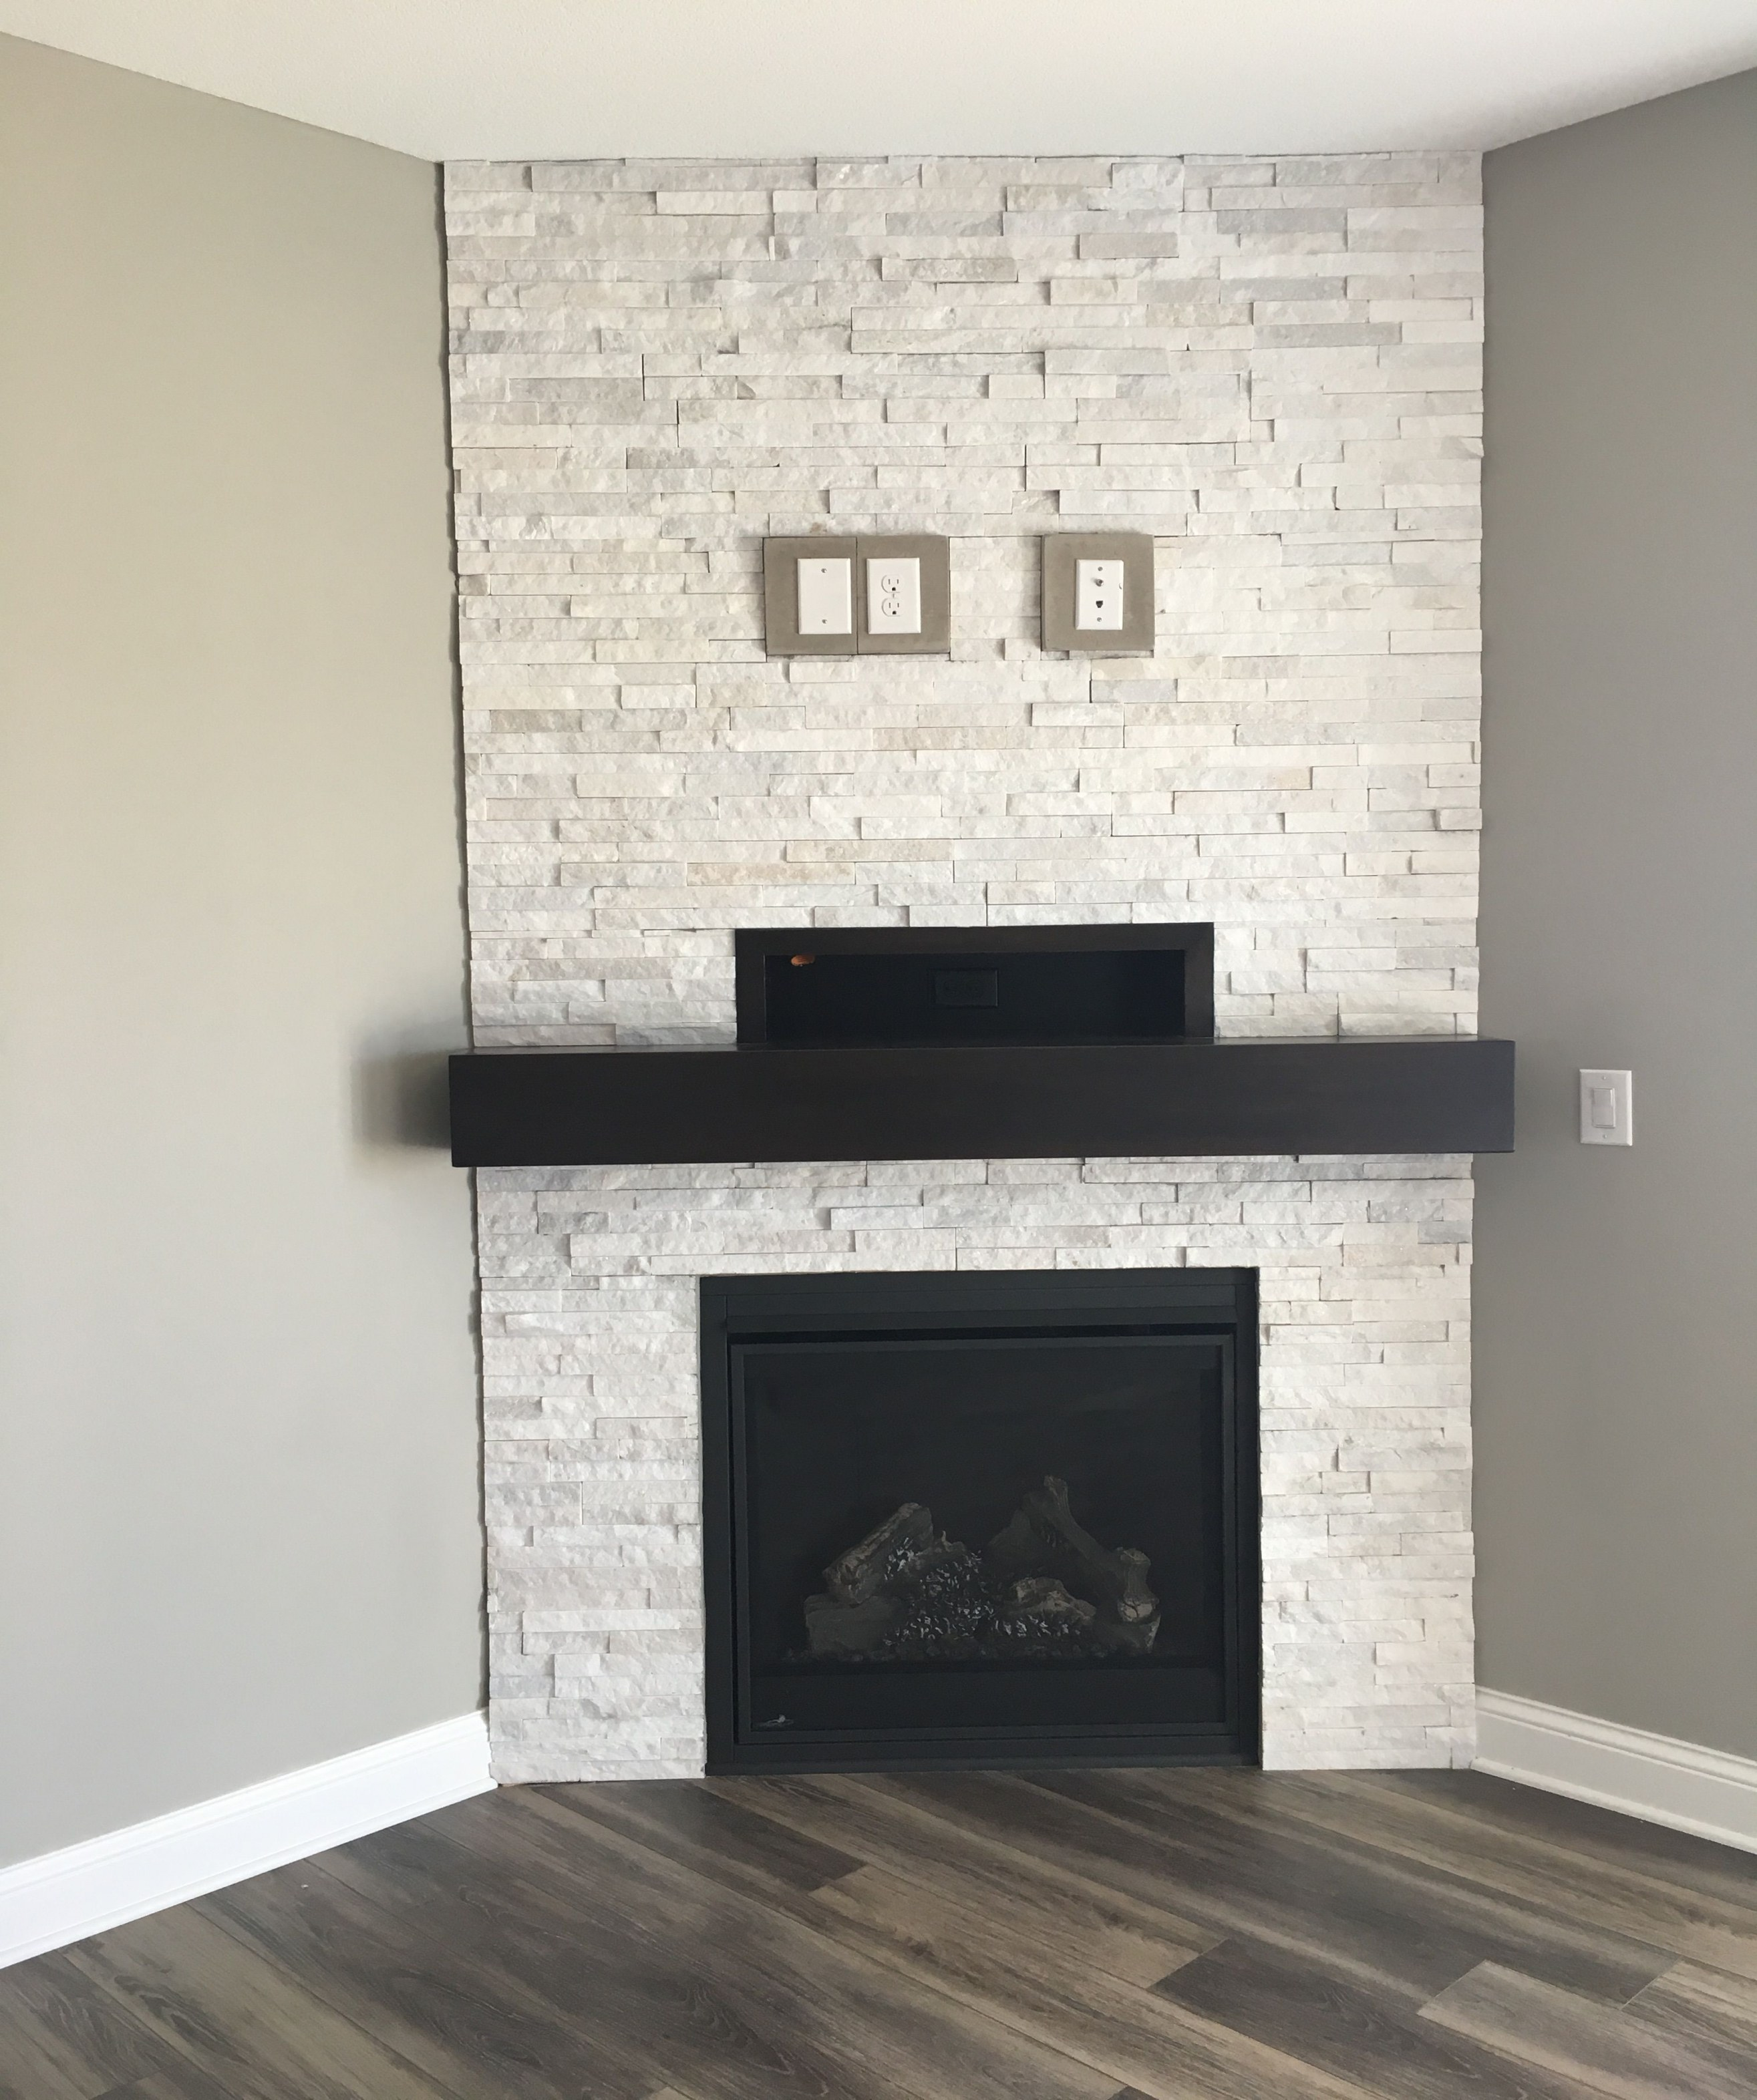 corner fireplace designs pin on fireplace ideas we love of corner fireplace designs